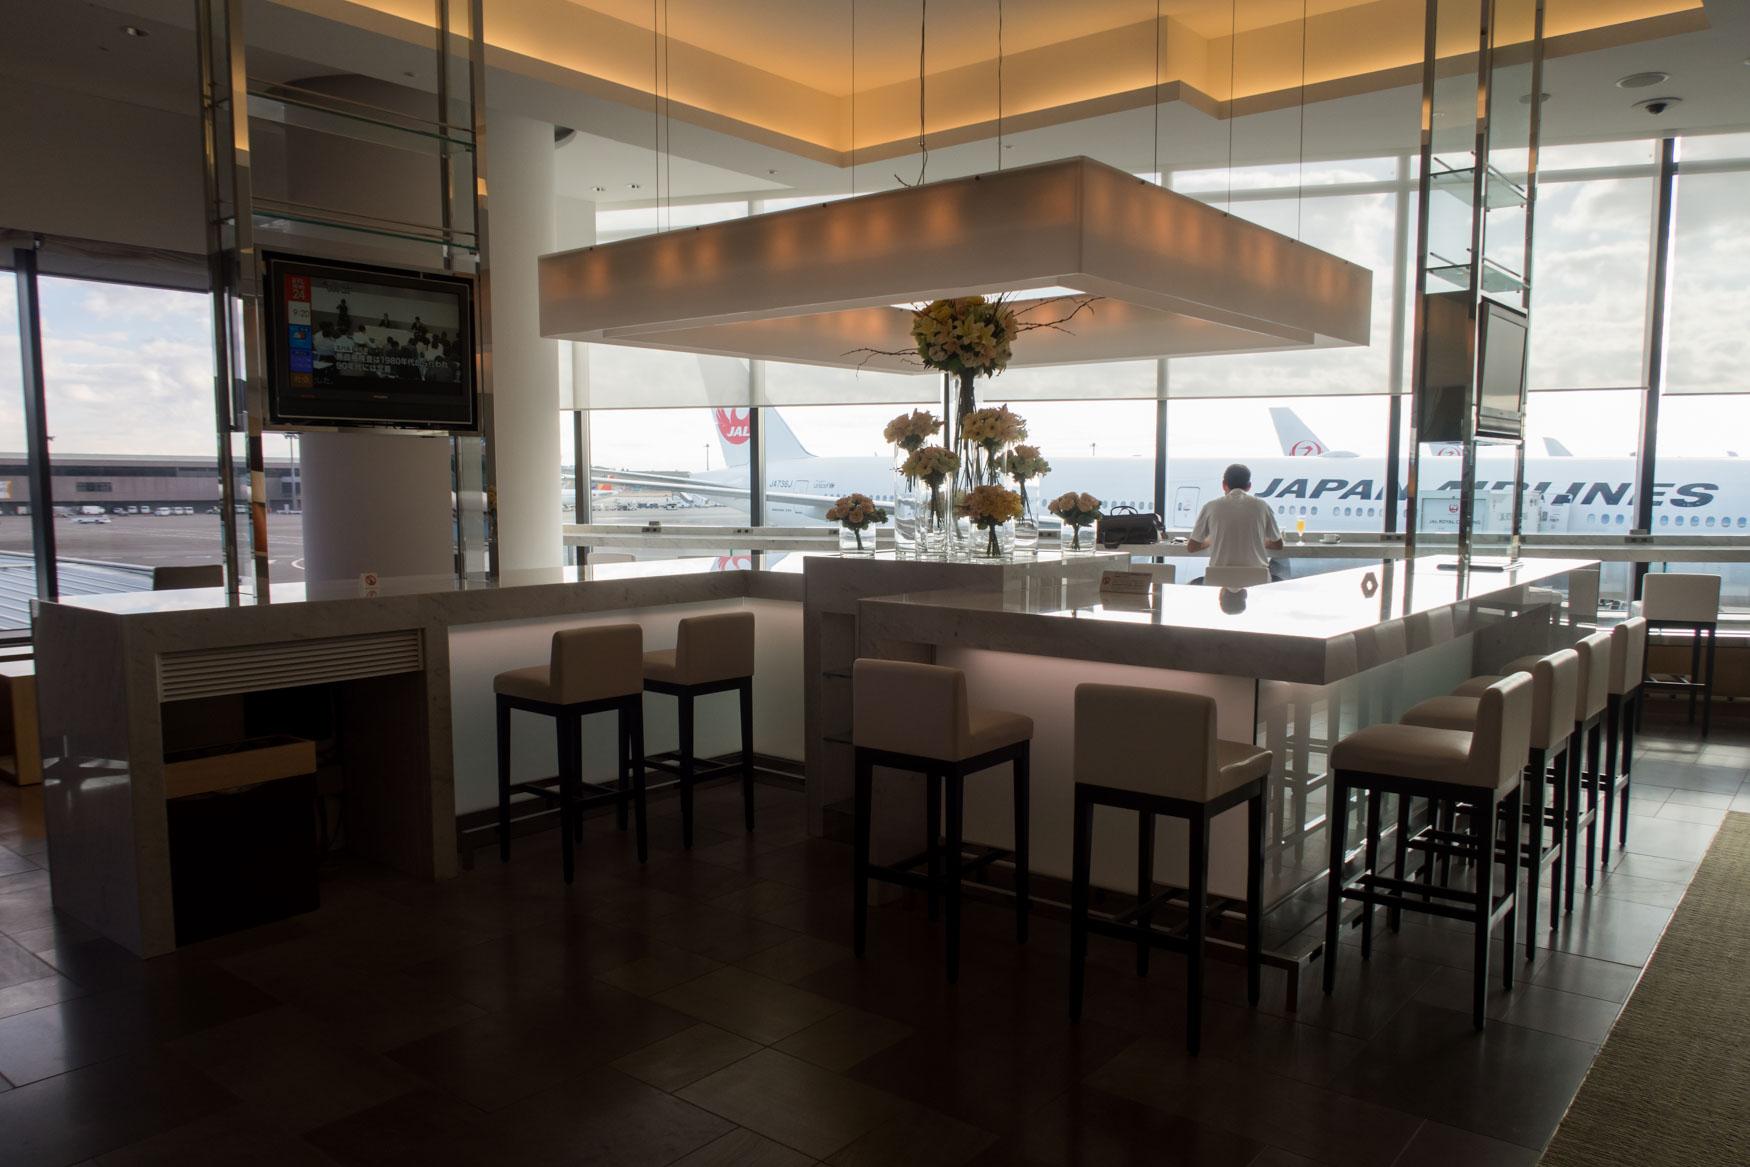 JAL Sakura Lounge Narita Bar Counter